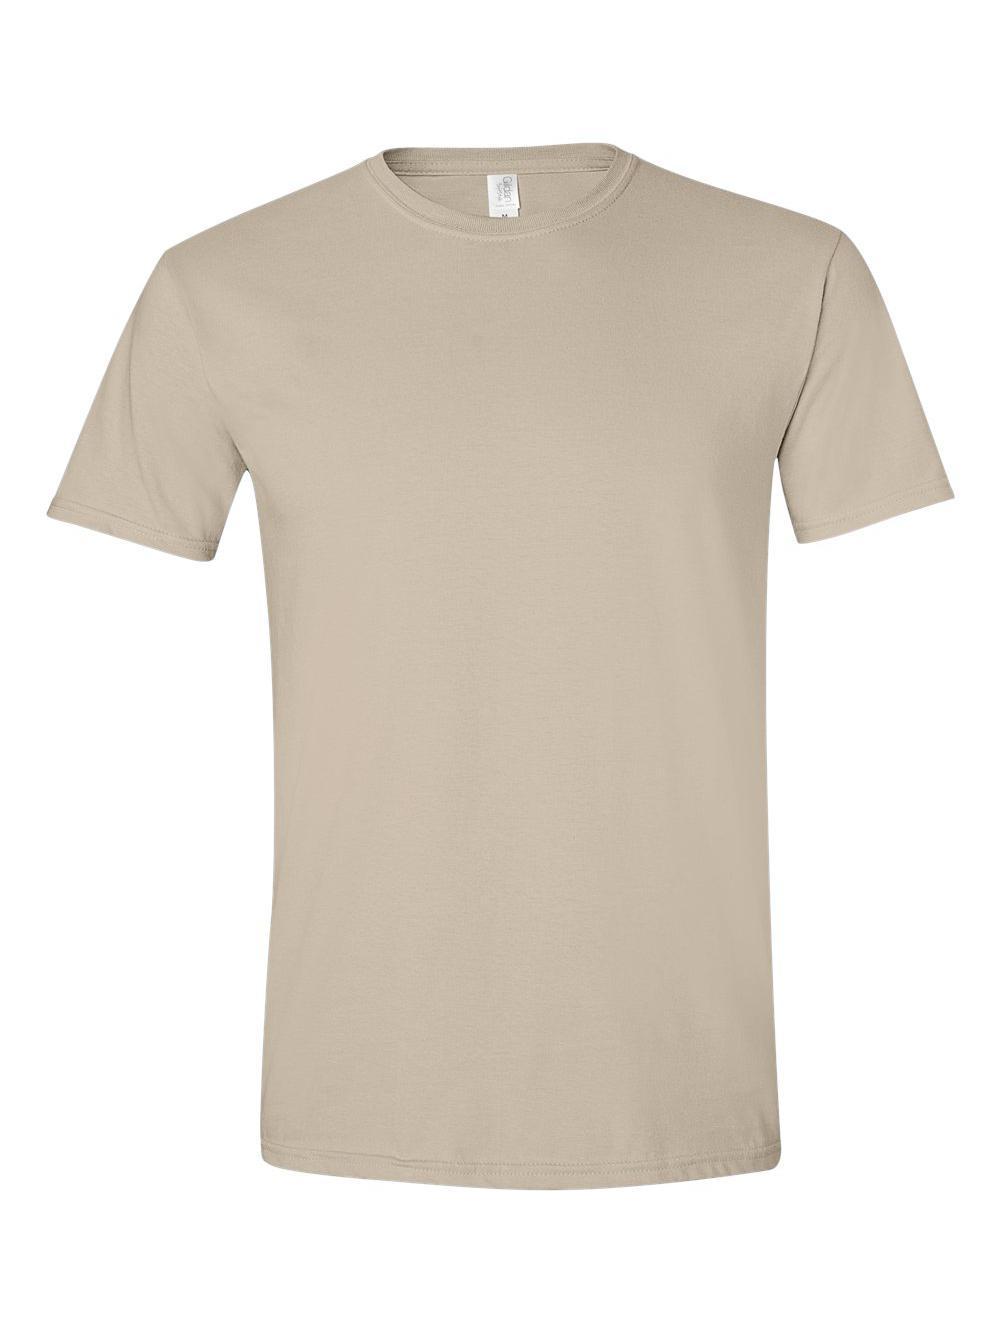 Gildan-Softstyle-T-Shirt-64000 thumbnail 156